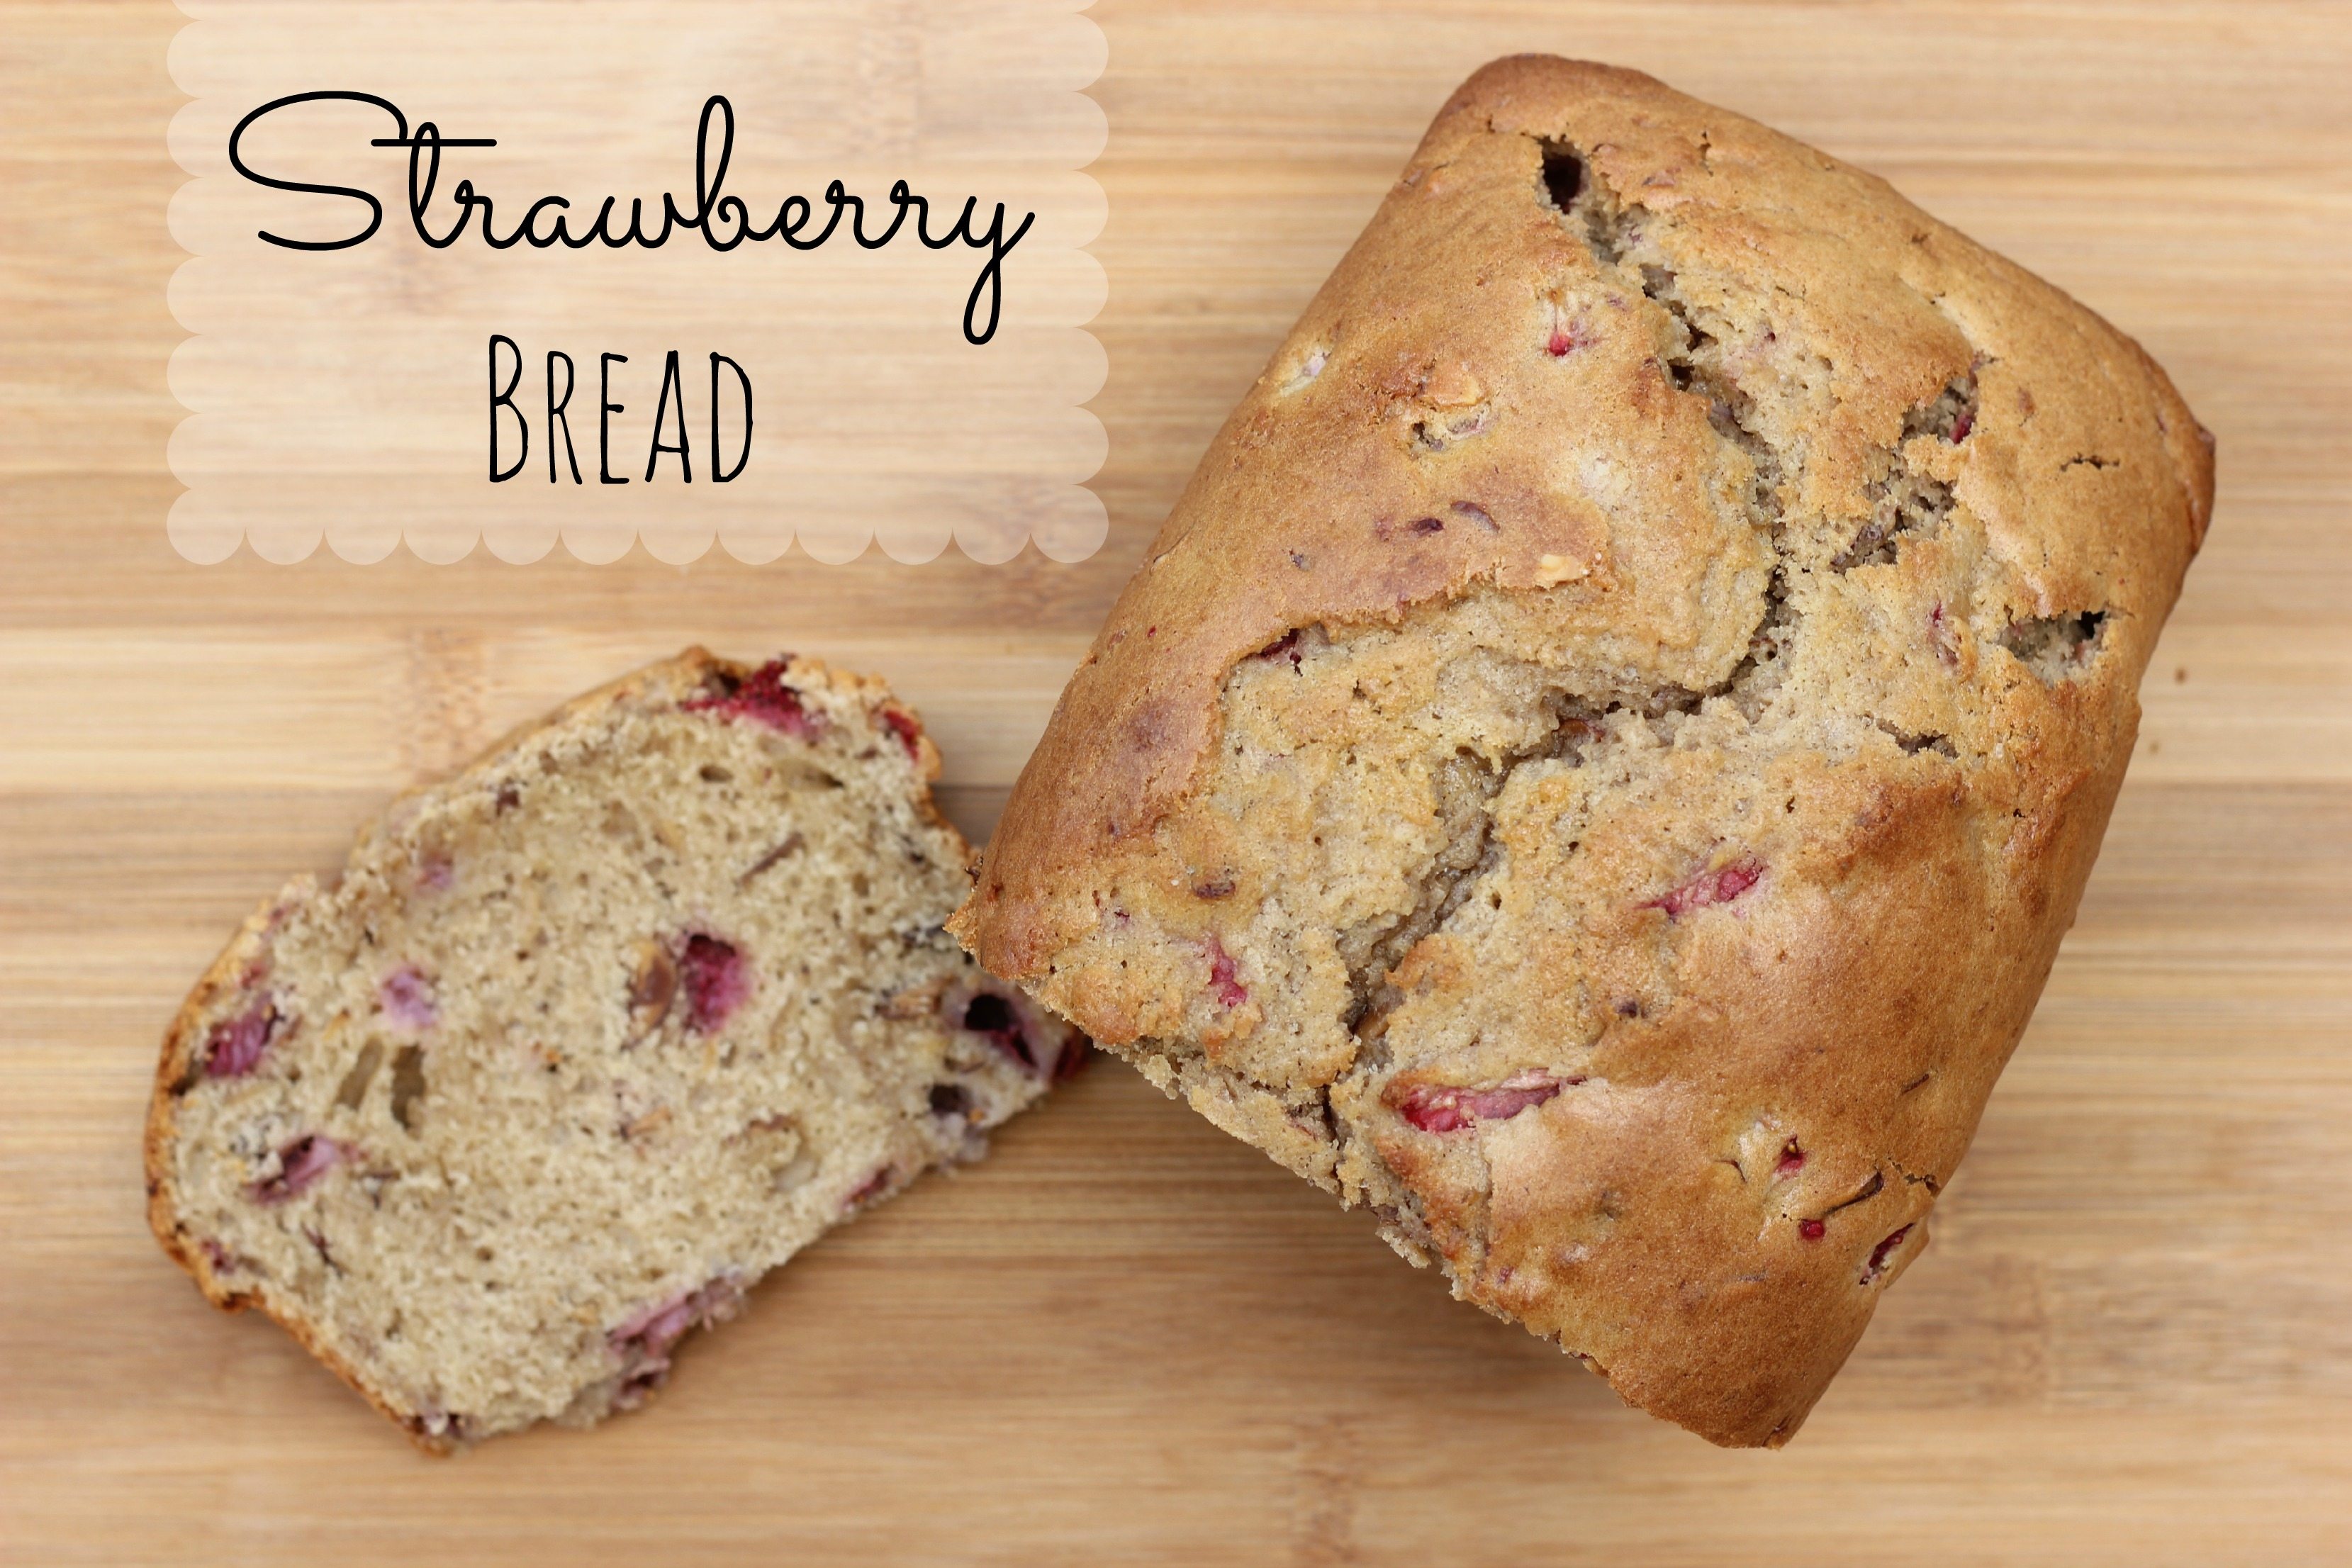 Strawberry Bread - Little Us